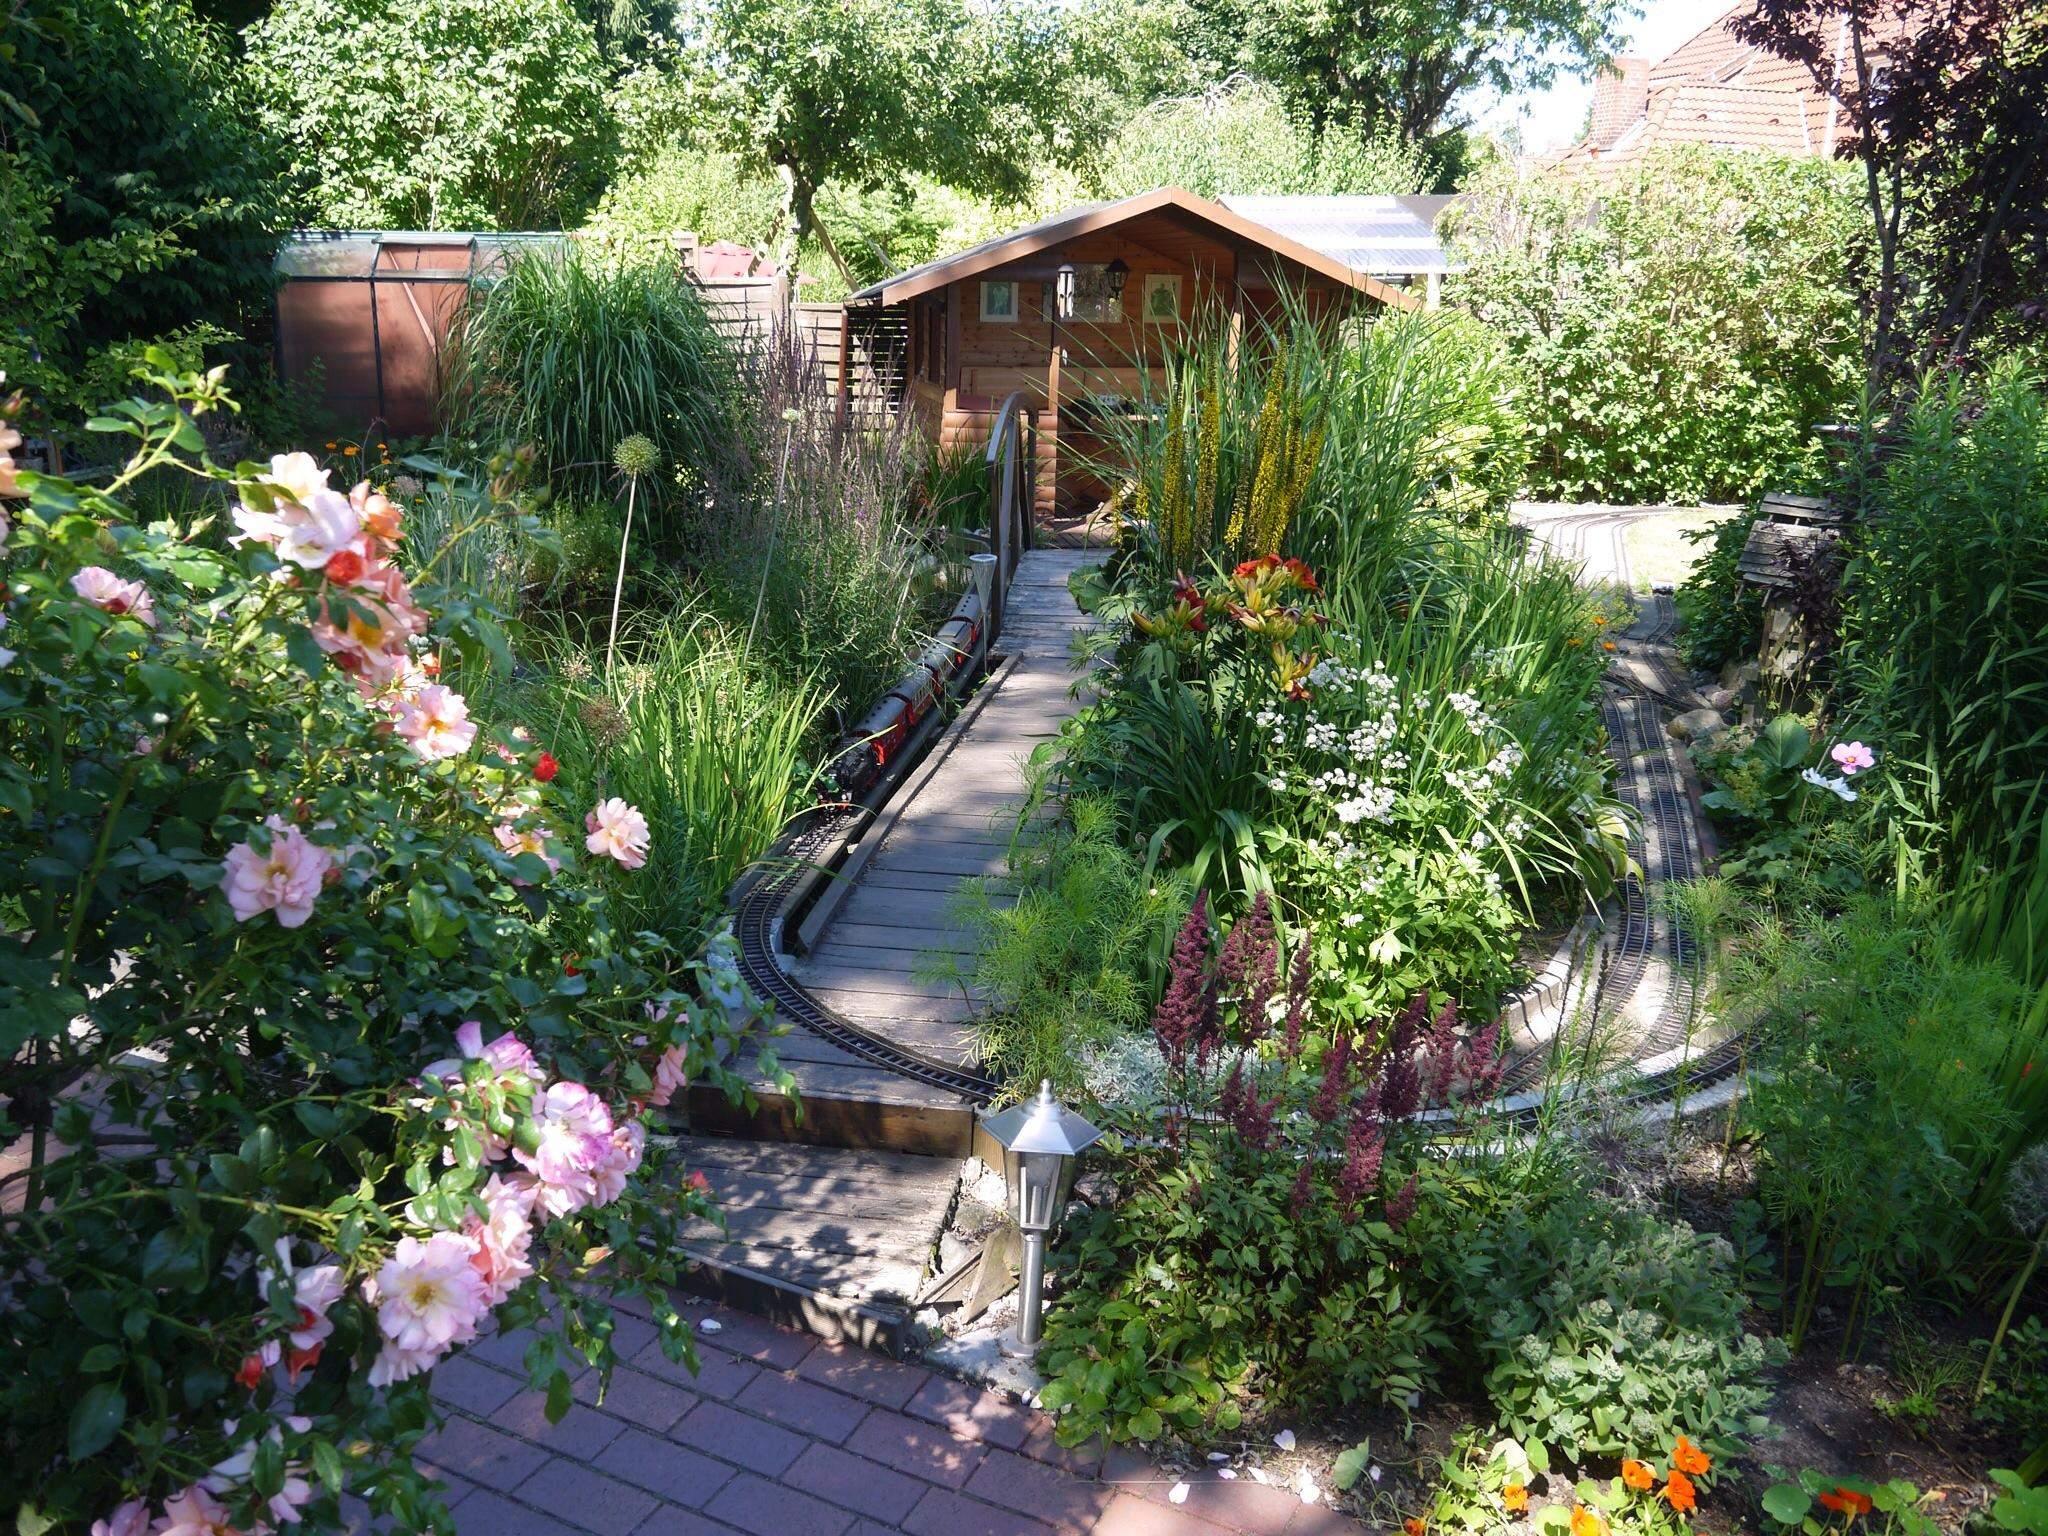 Garten Sitzecke Neu Gartengestaltung Bilder Sitzecke